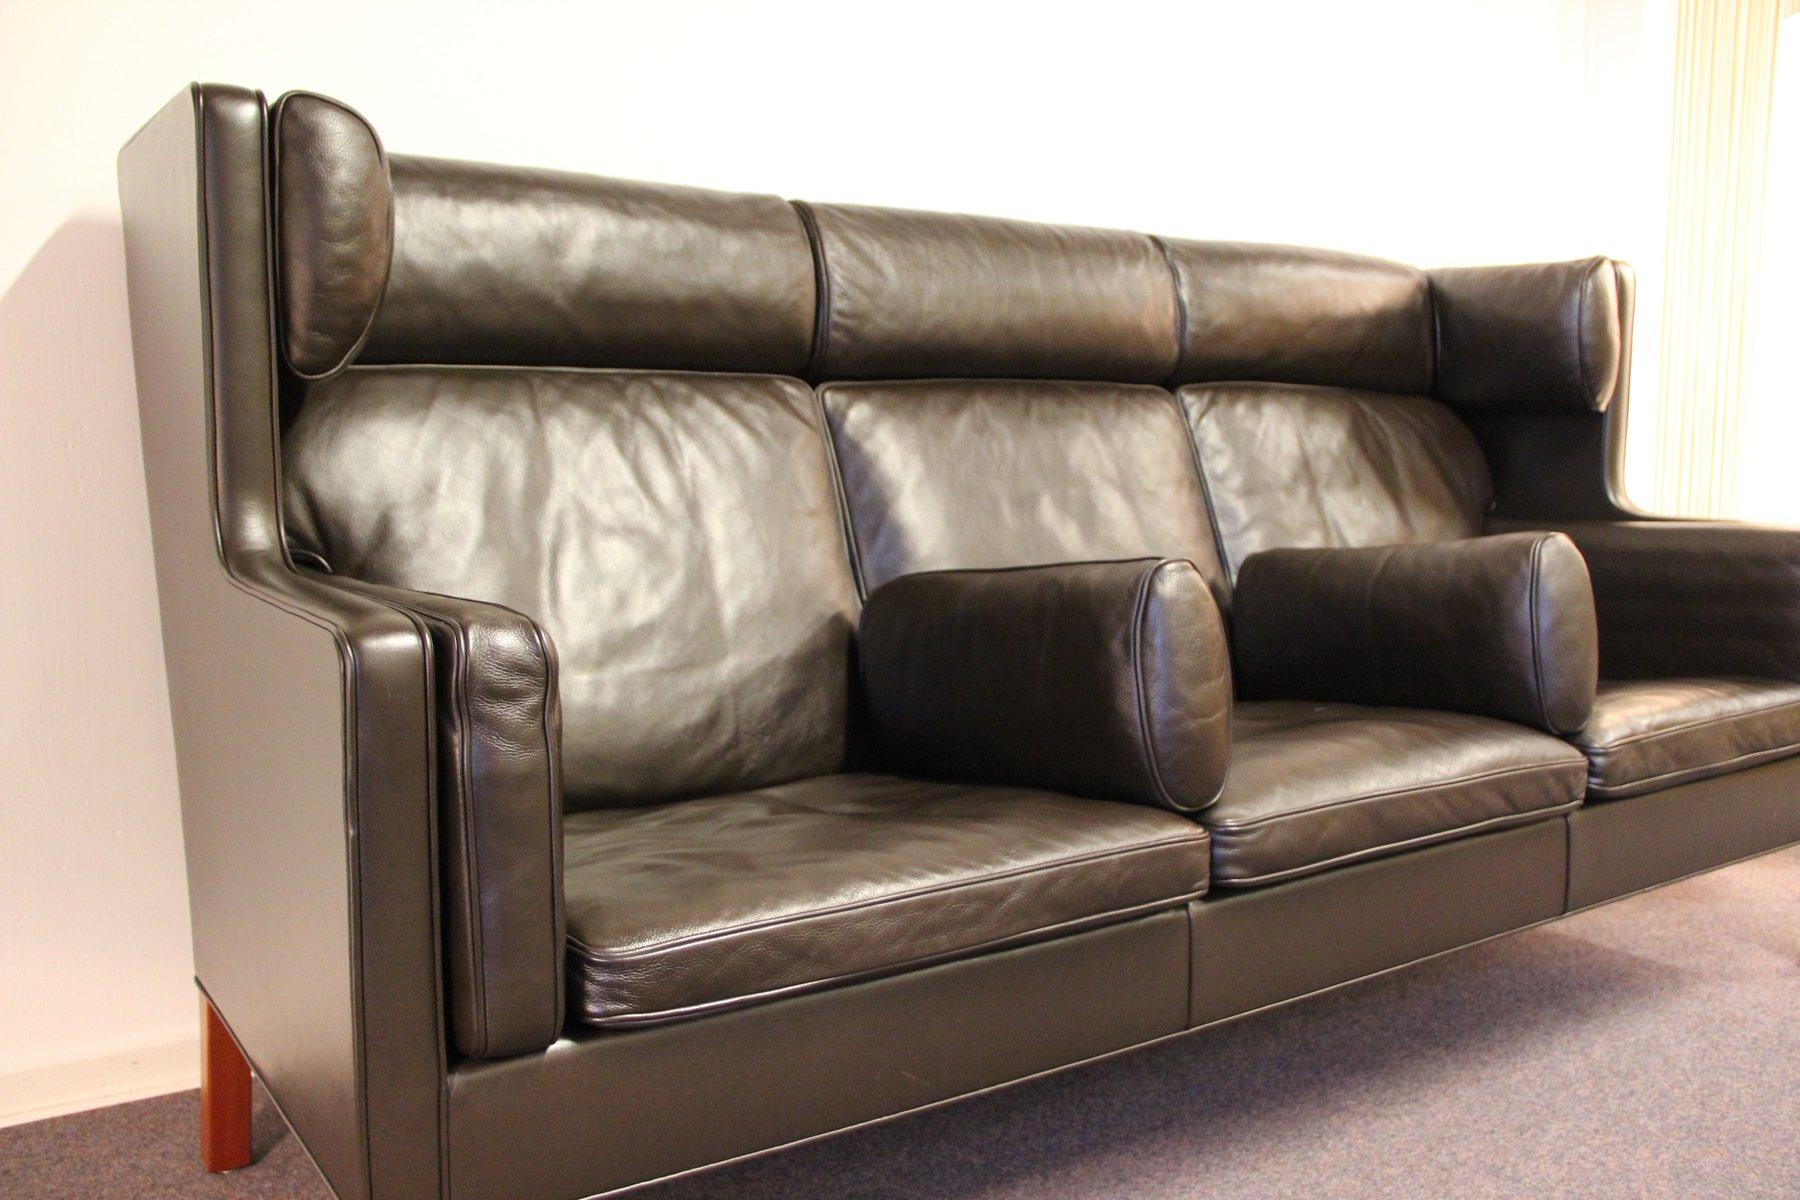 bm 2193 kup sofa von b rge mogensen f r fredericia. Black Bedroom Furniture Sets. Home Design Ideas